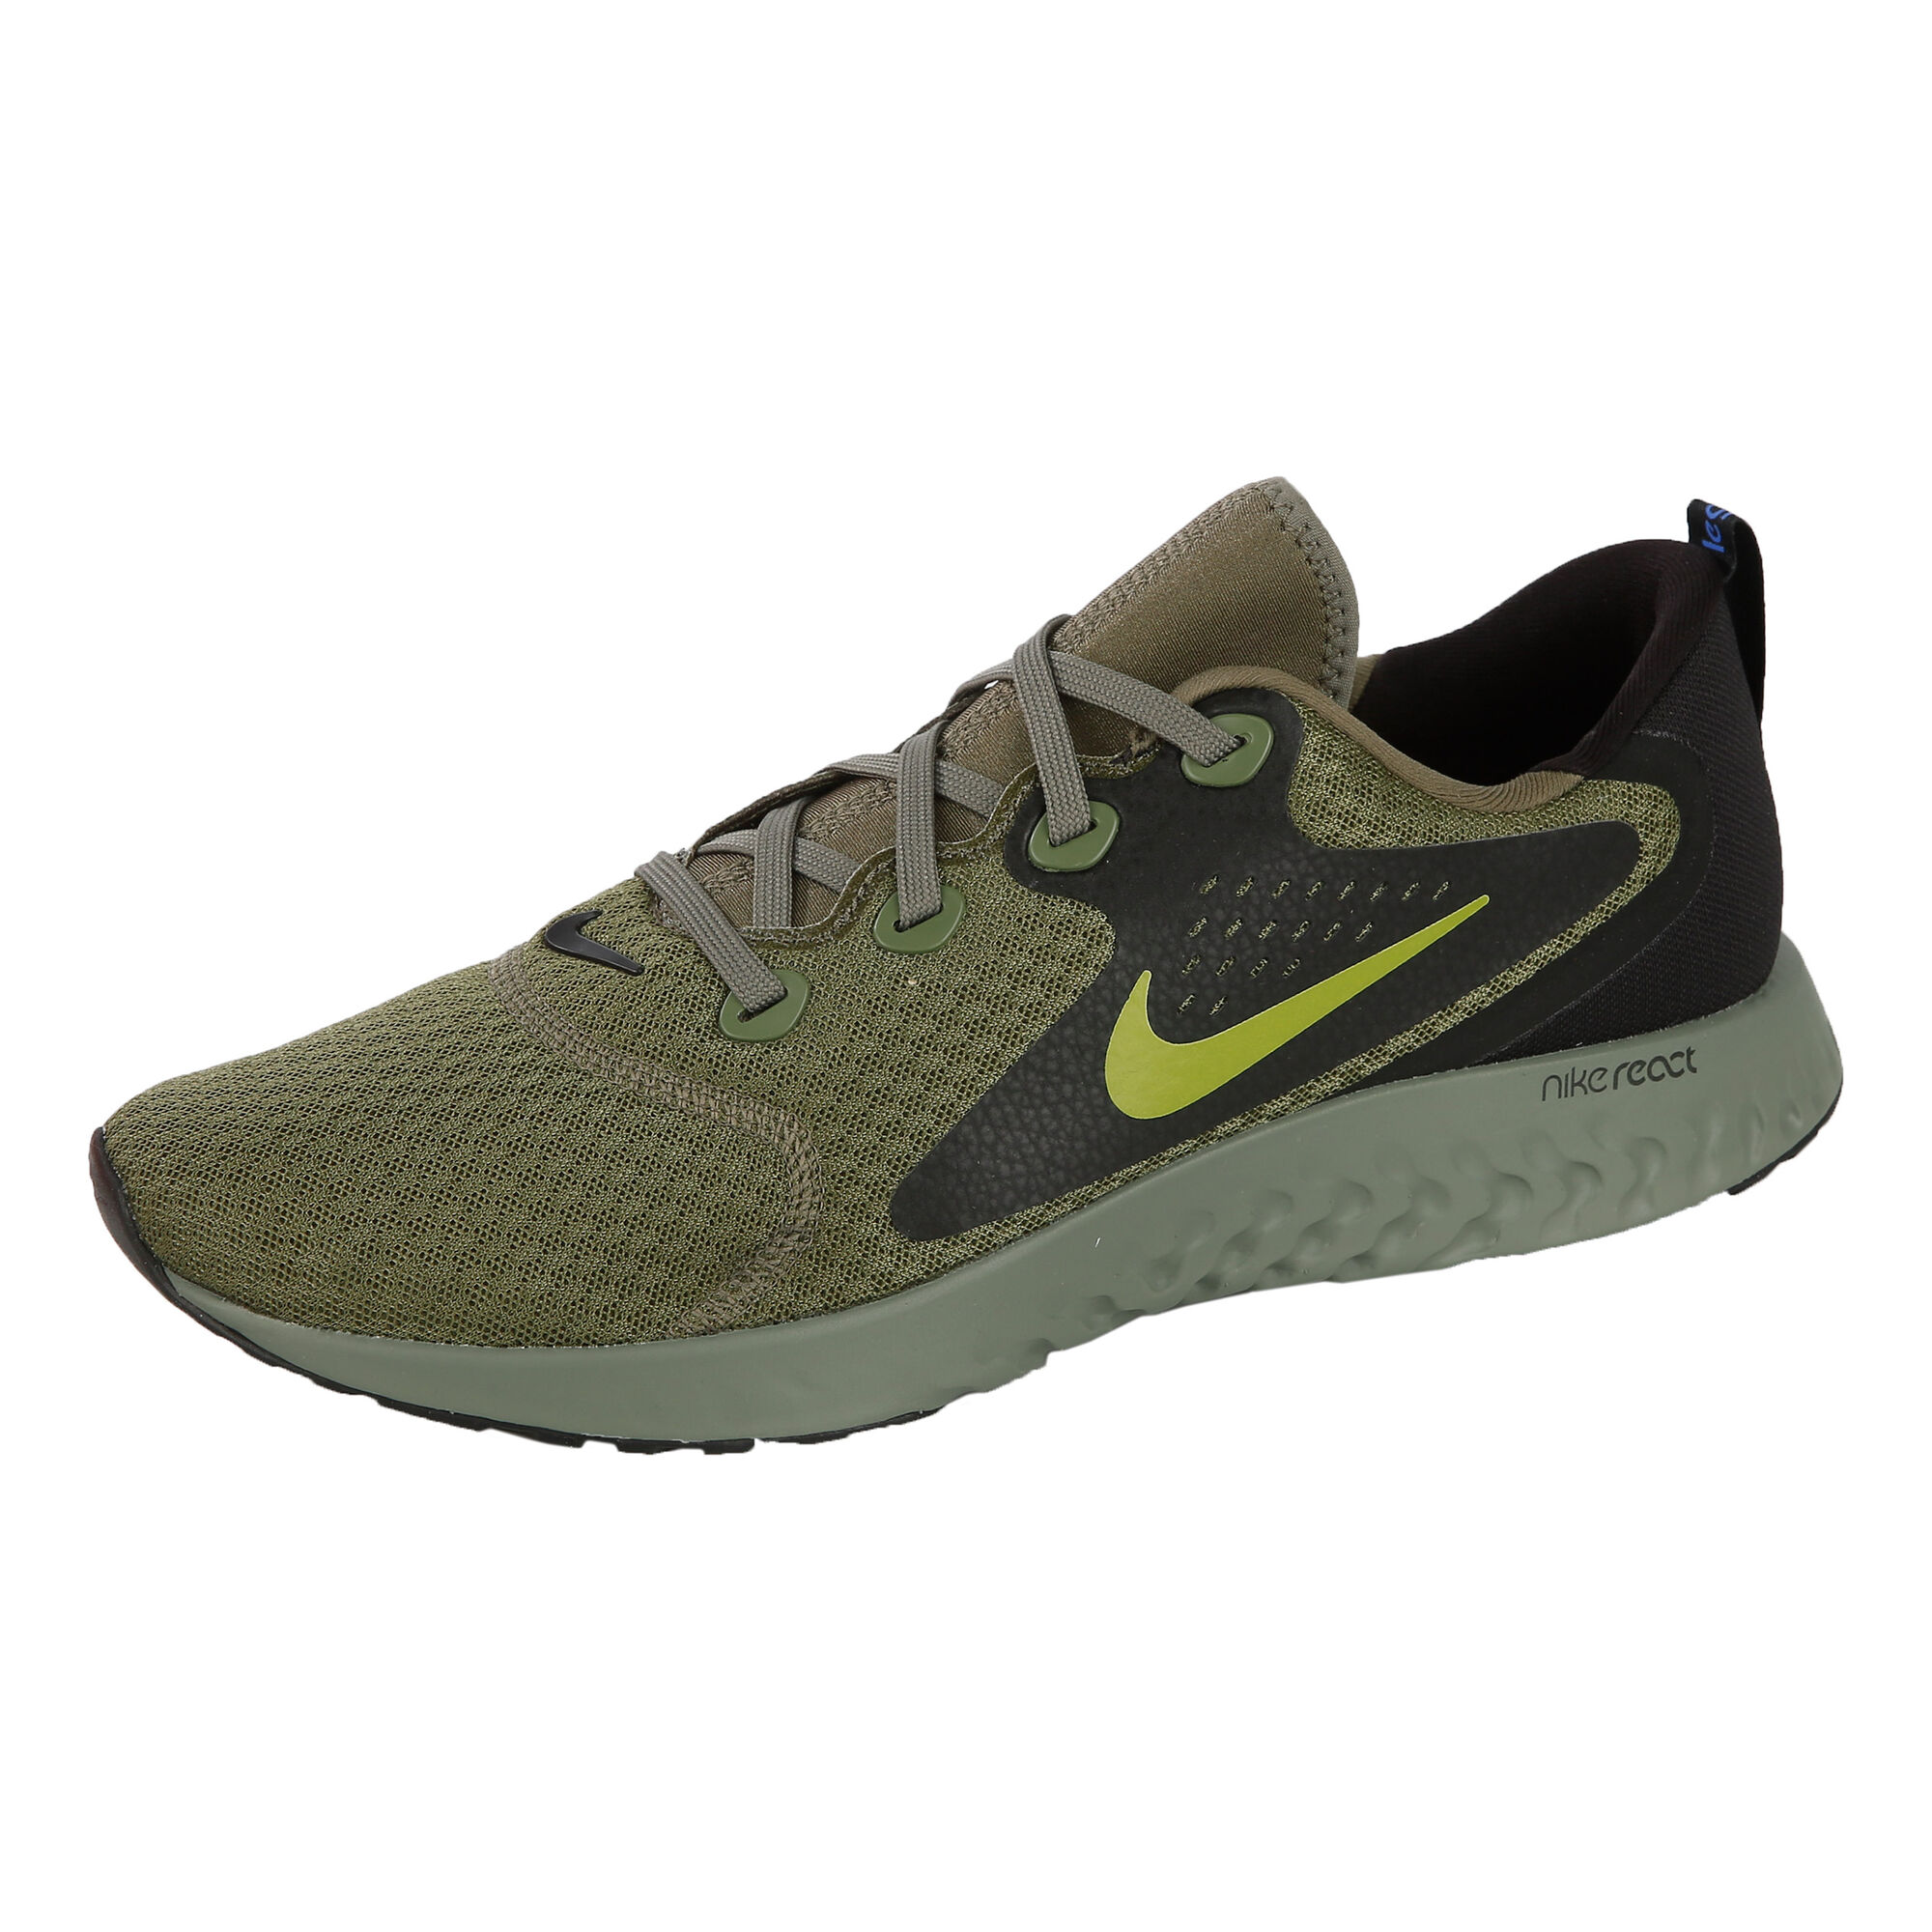 d0d691ff376fa buy Nike Rebel React Neutral Running Shoe Men - Olive